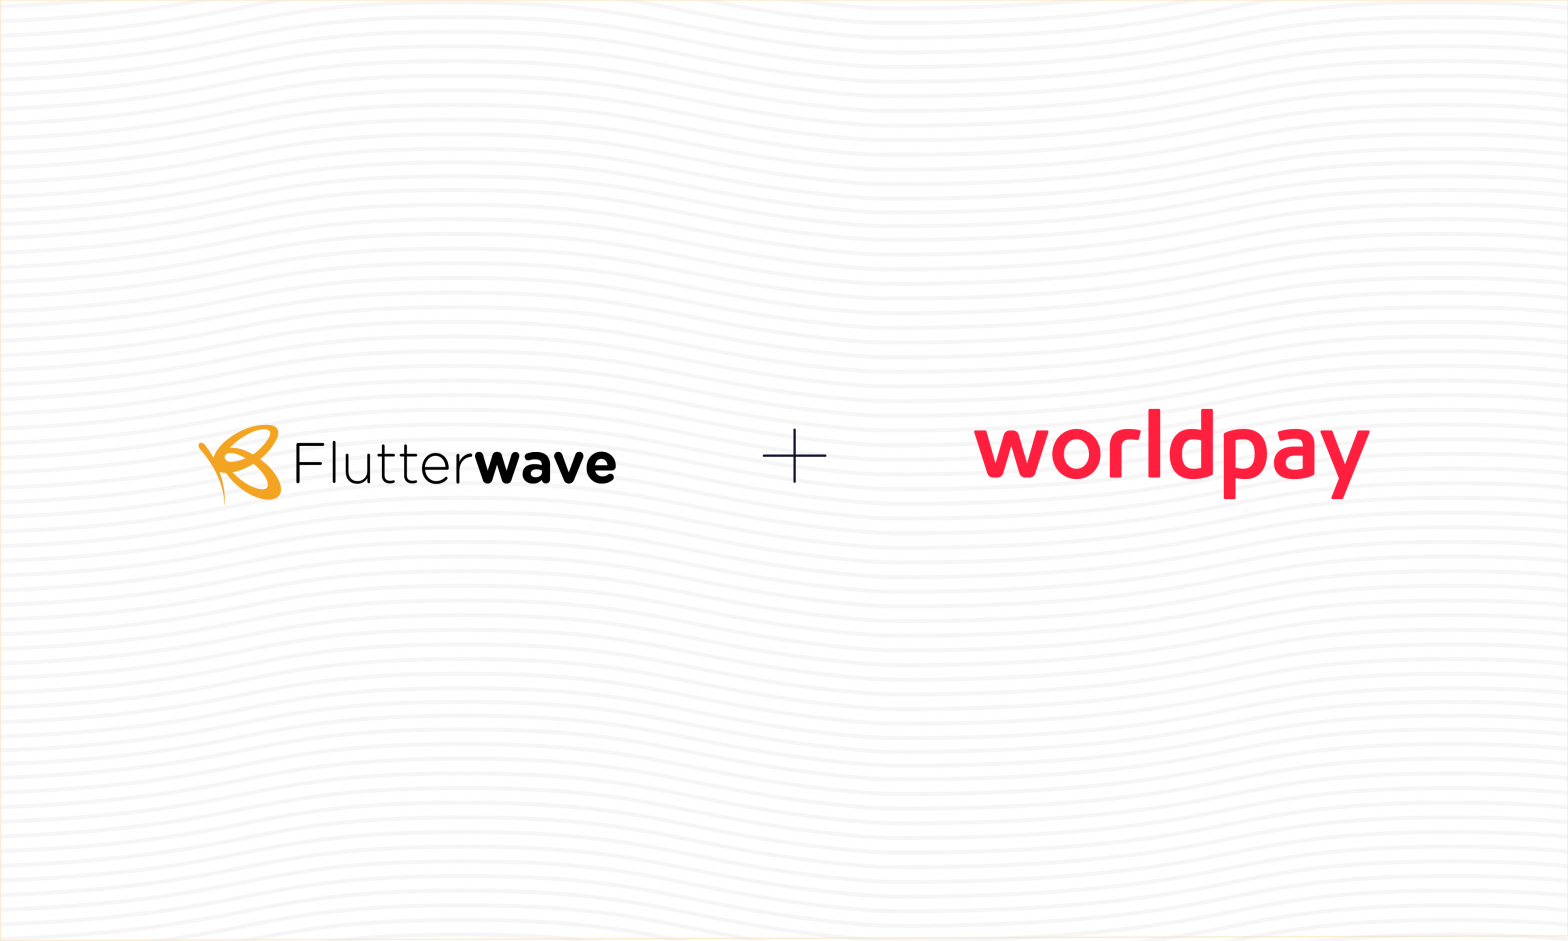 Flutterwave and Worldpay